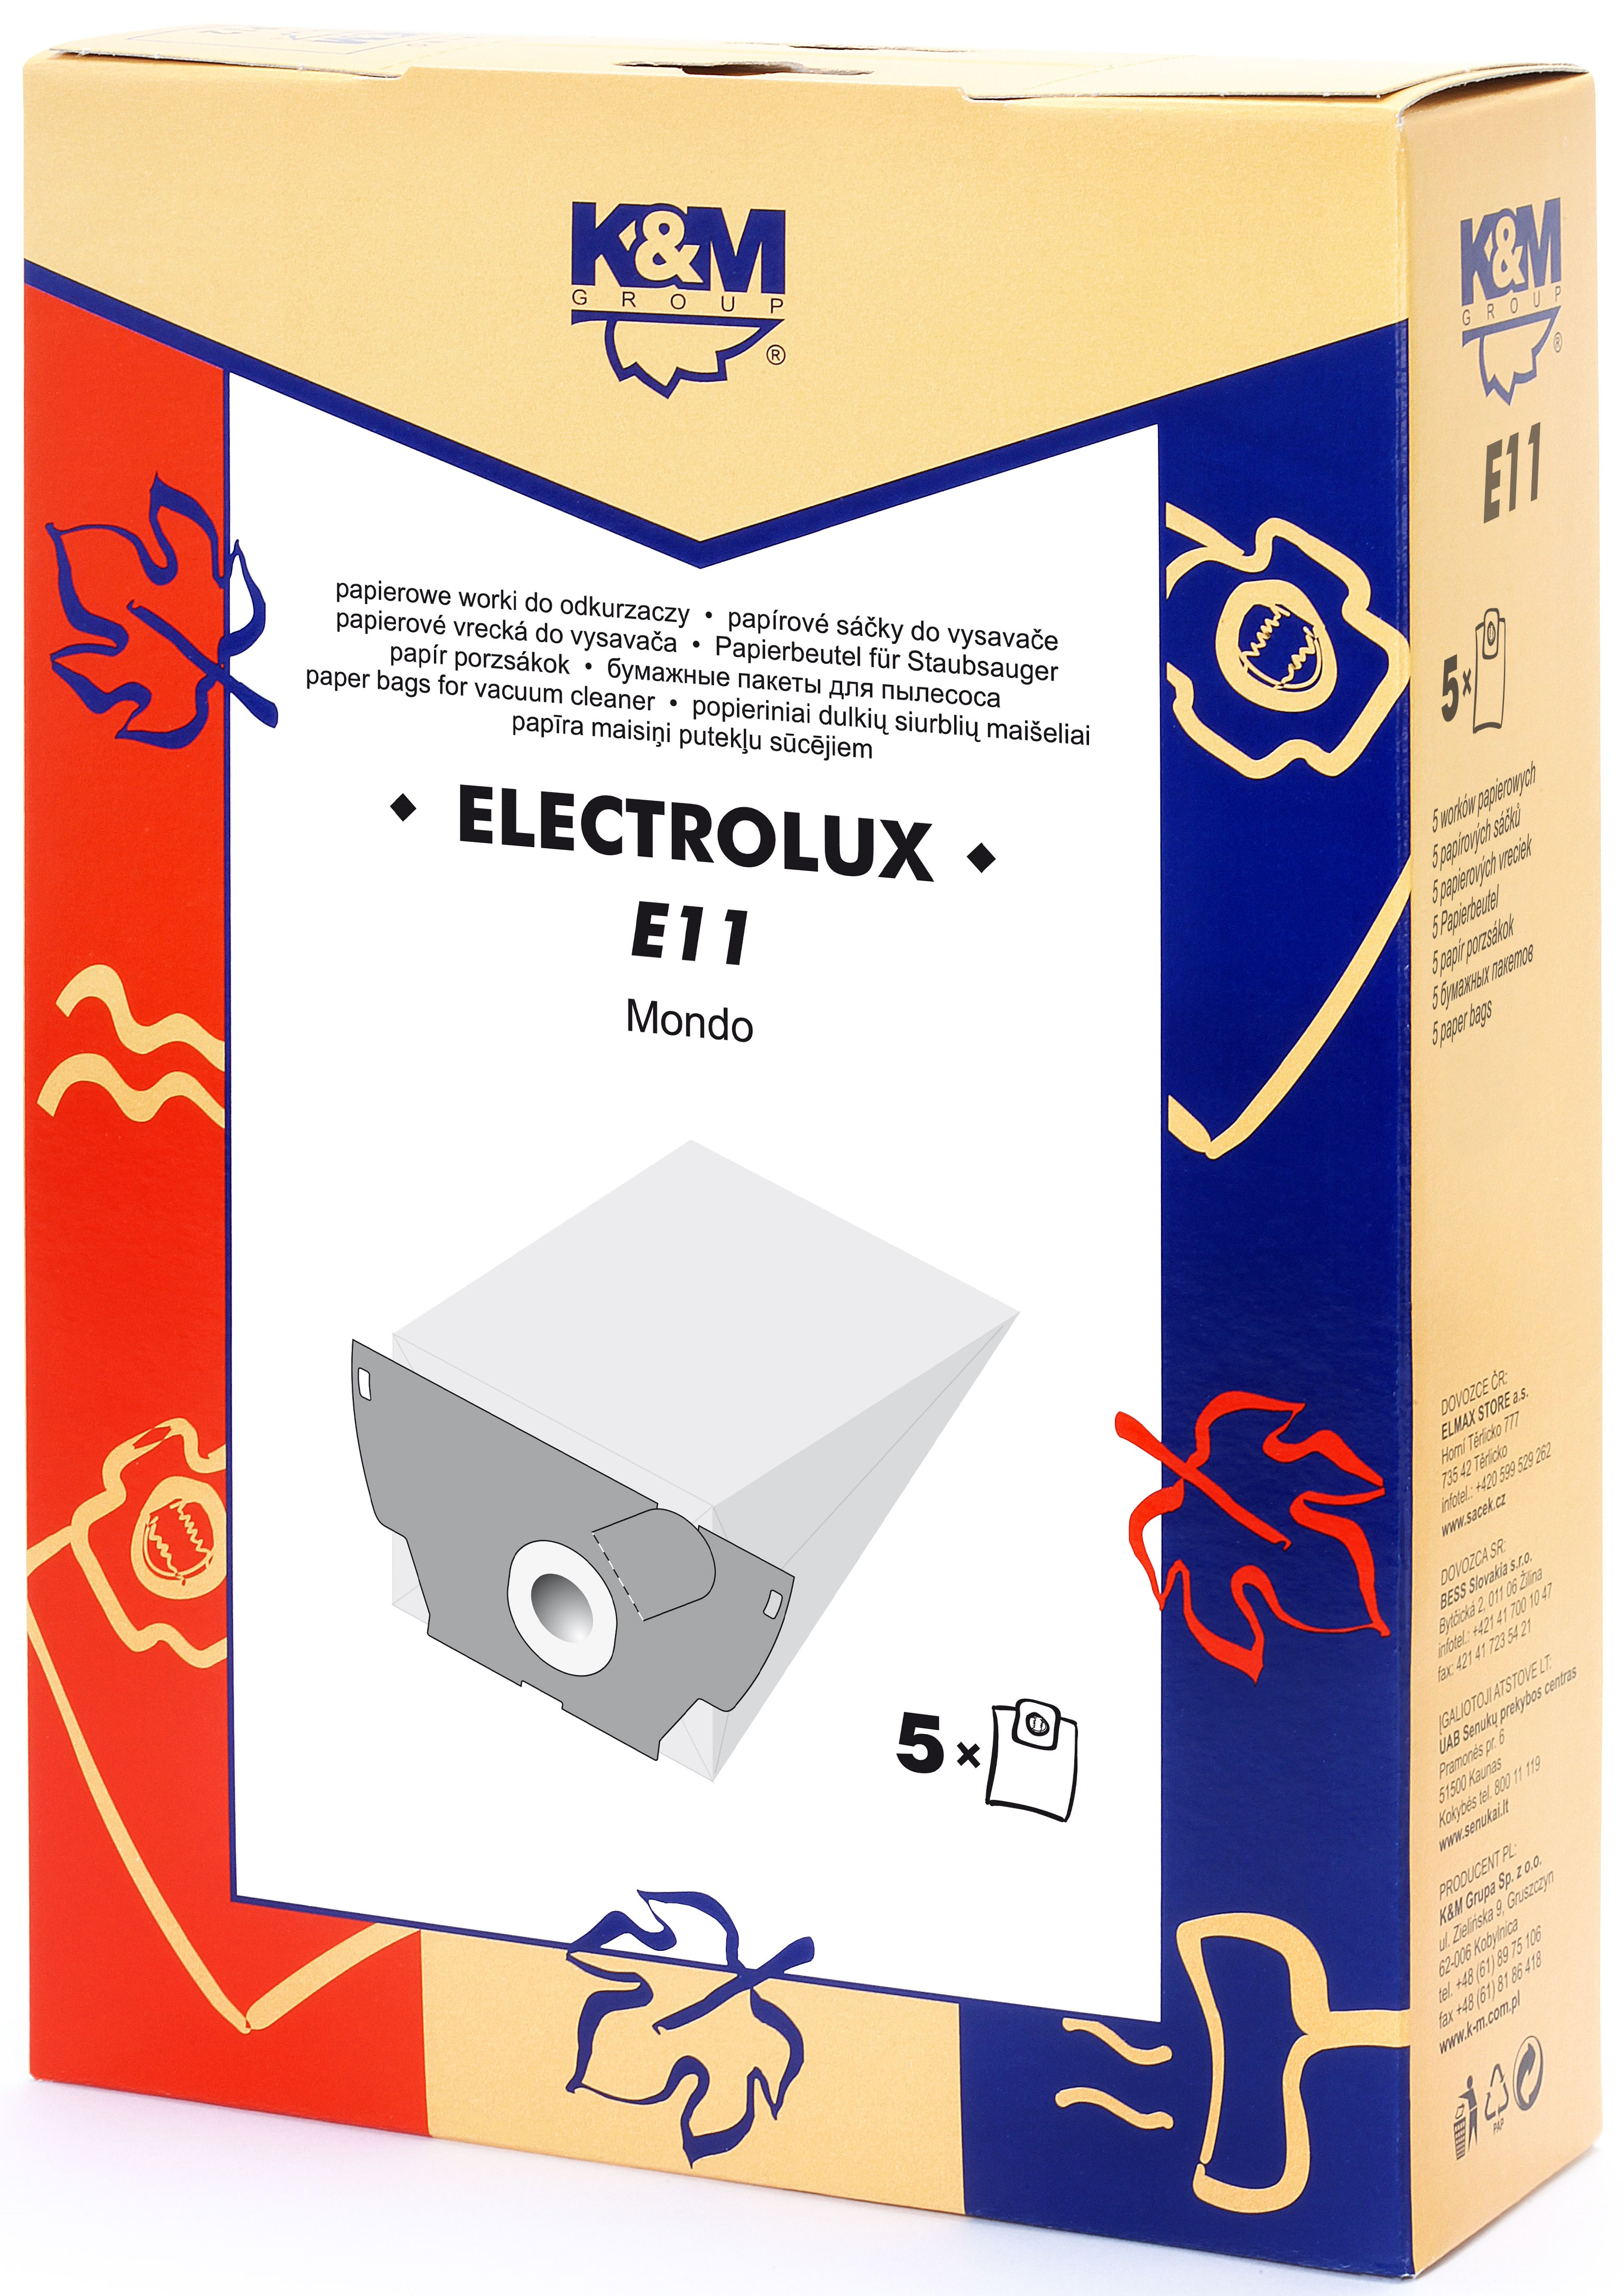 Sac aspirator Electrolux Mondo, hartie, 5X saci, KM